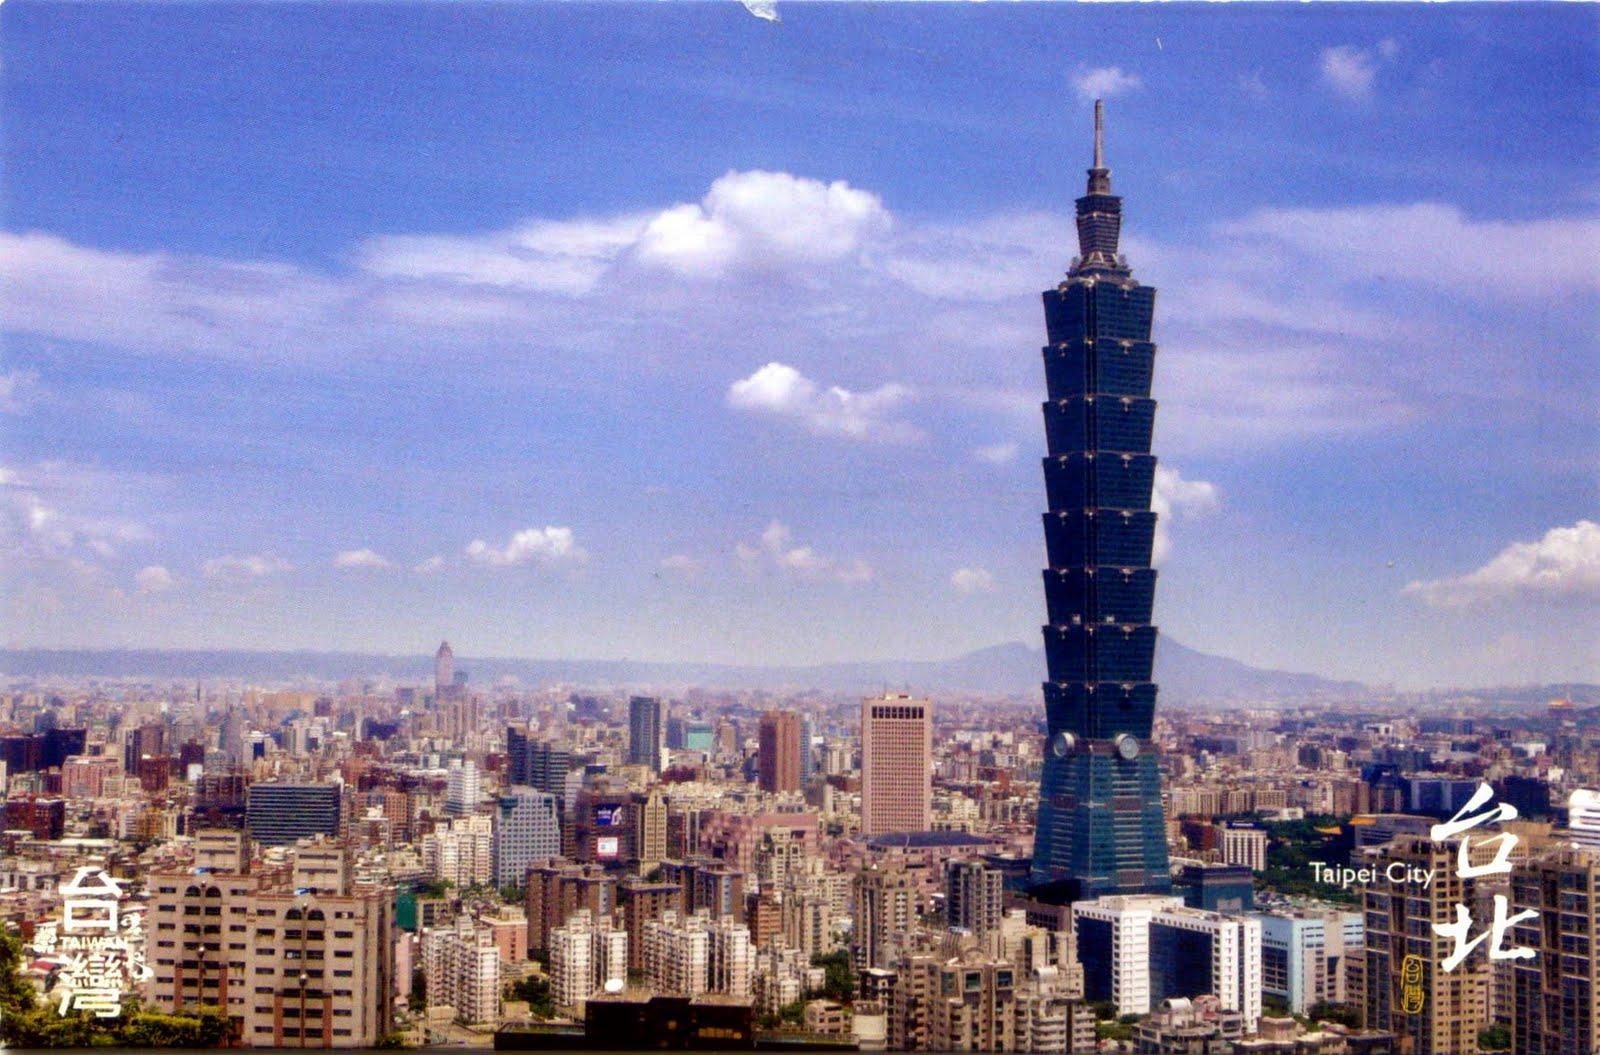 Petites fen tres sur le monde taipei 101 for Mondial fenetre